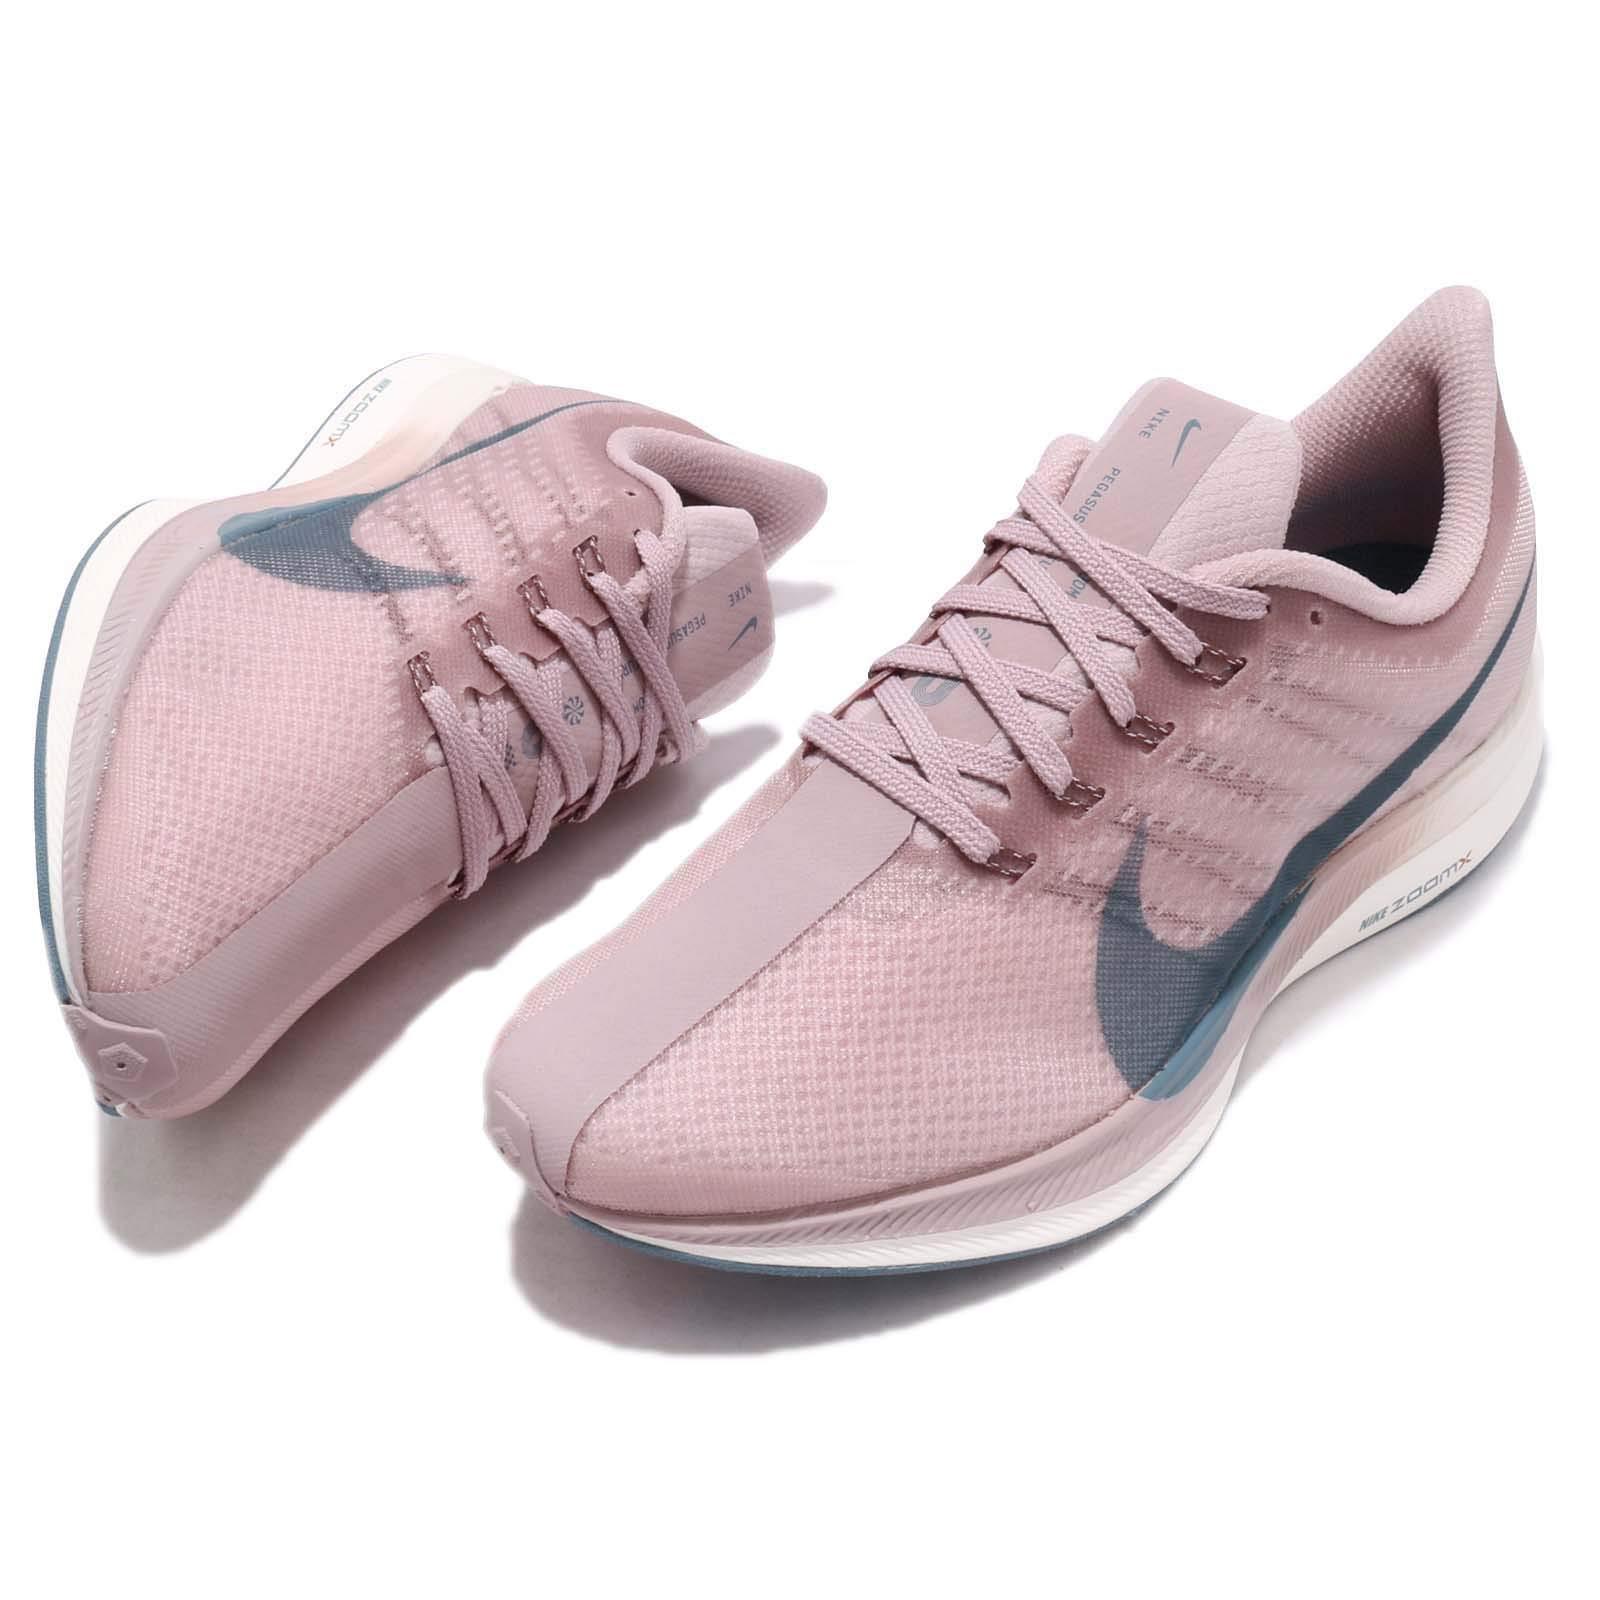 super popular 187e7 8d935 Nike Women's W Zoom Pegasus 35 Turbo Track & Field Shoes ...